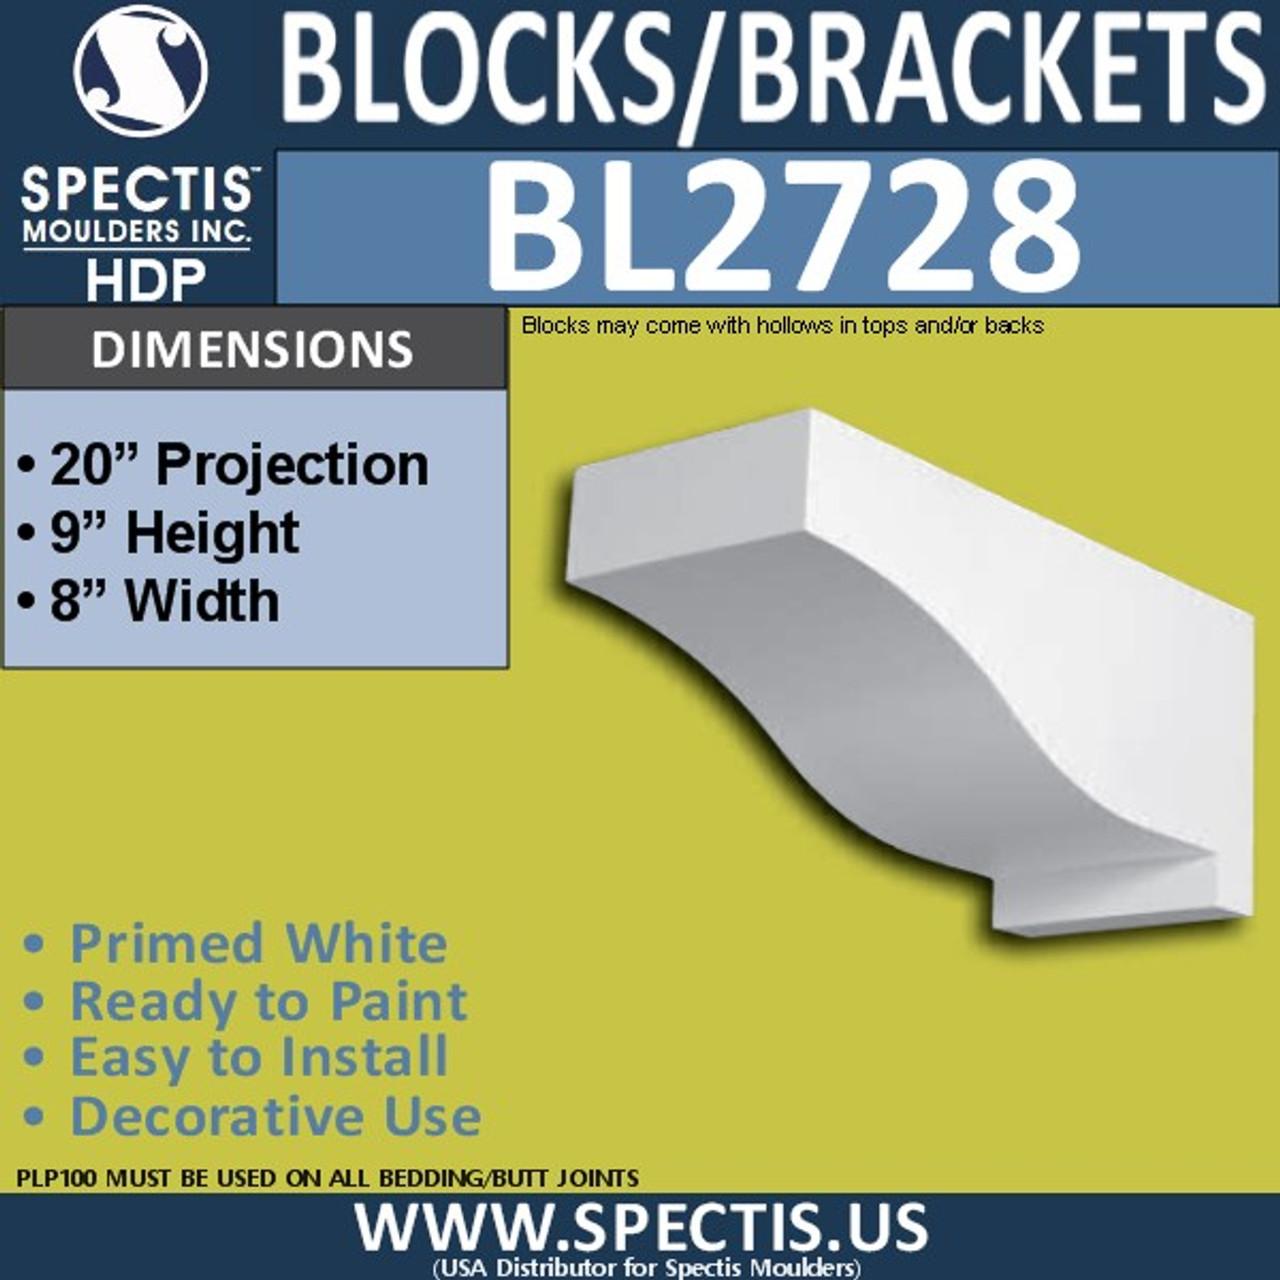 "BL2728 Eave Block or Bracket 8""W x 9""H x 20"" P"